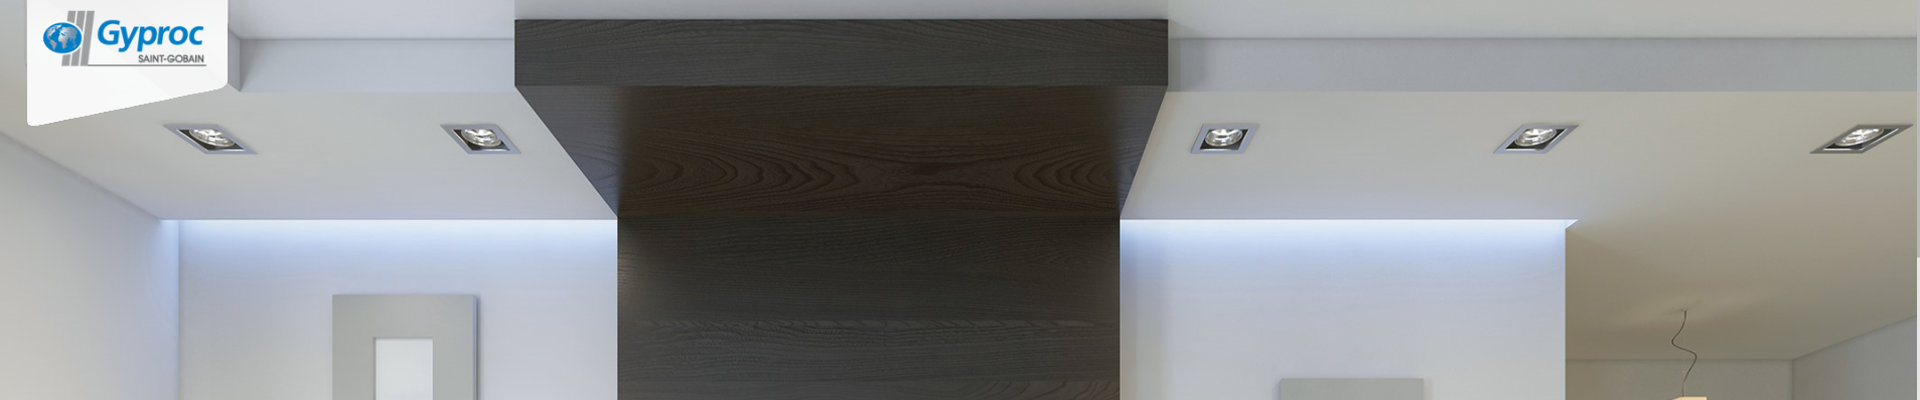 Gyproc Faux-plafond